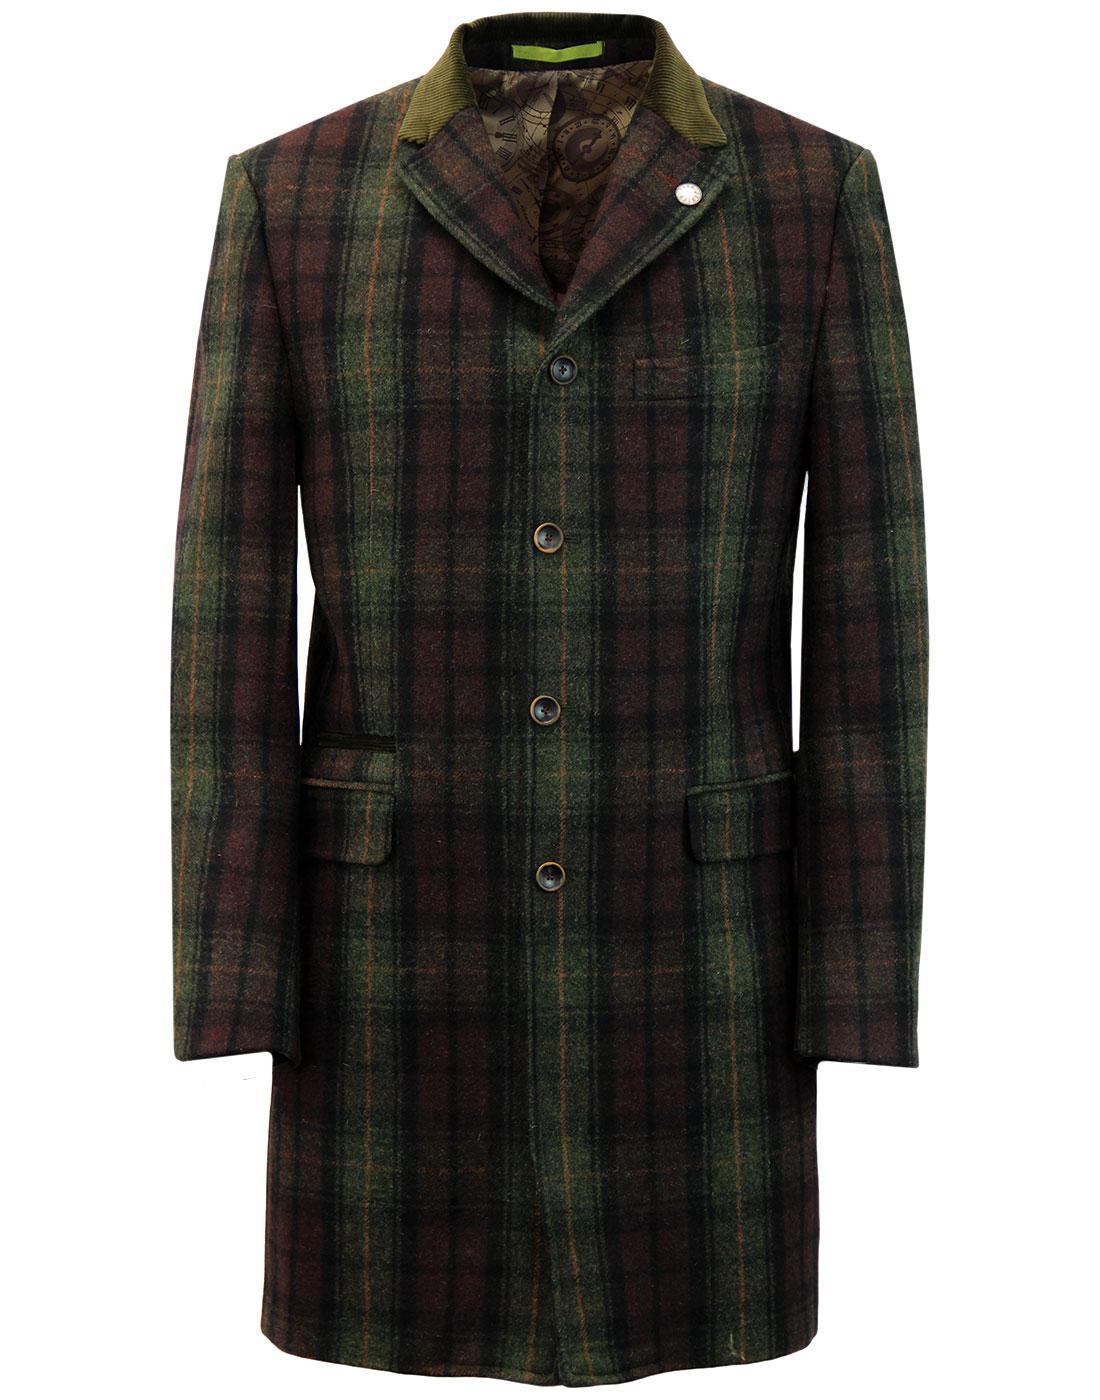 Winnie GIBSON LONDON 3/4 Length Cord Collar Coat G